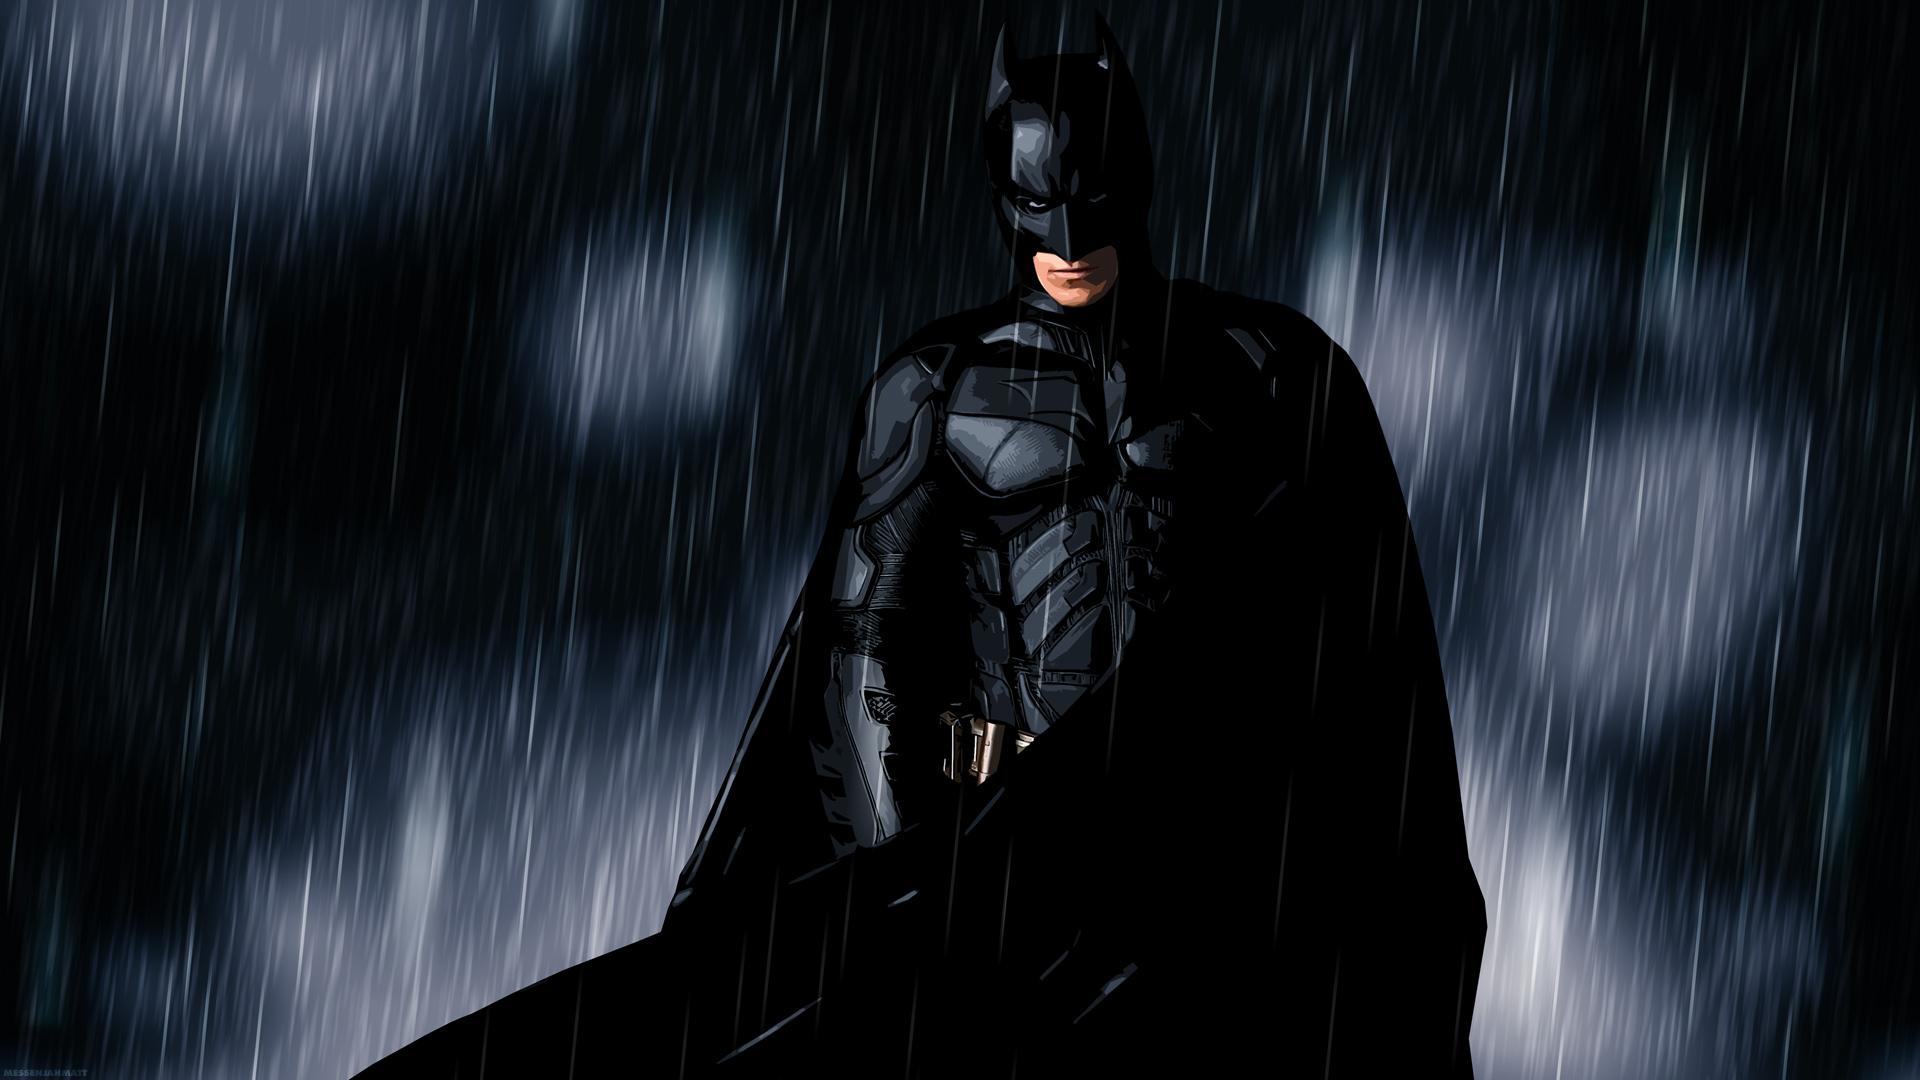 The Dark Knight HD Wallpaper | Background Image ...